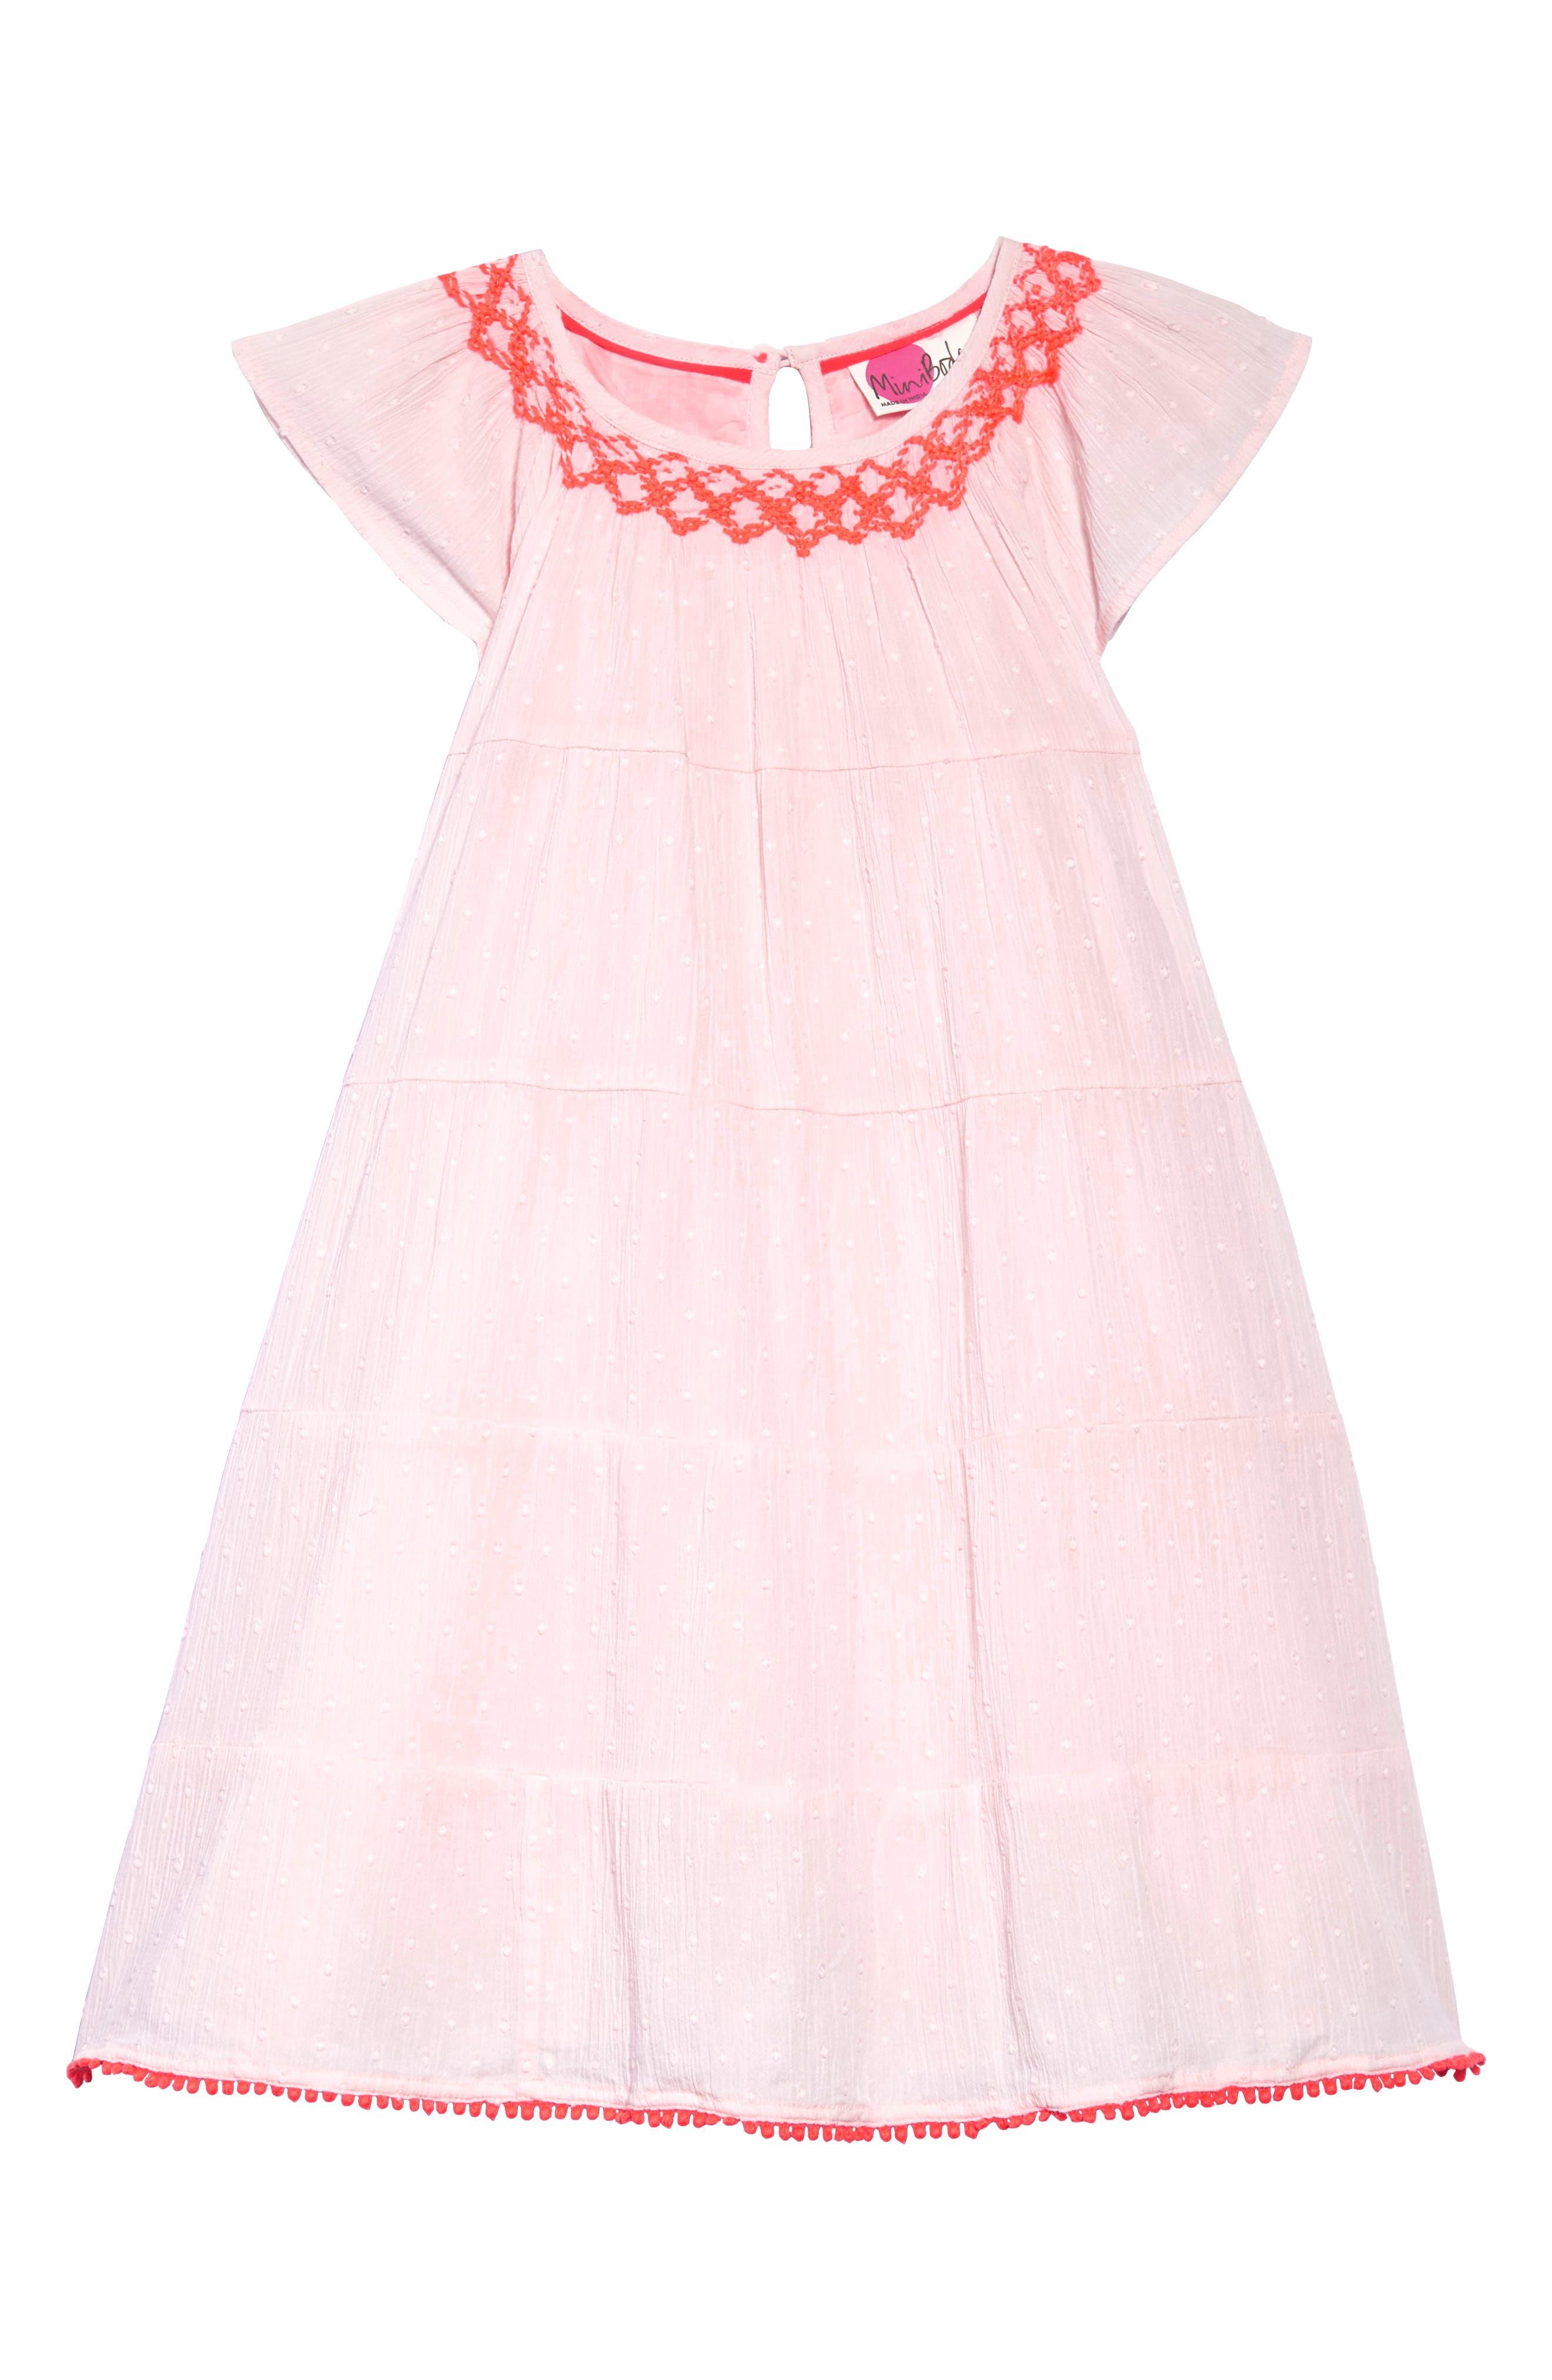 Twirly Dress,                             Main thumbnail 1, color,                             Pink Mist Pnk